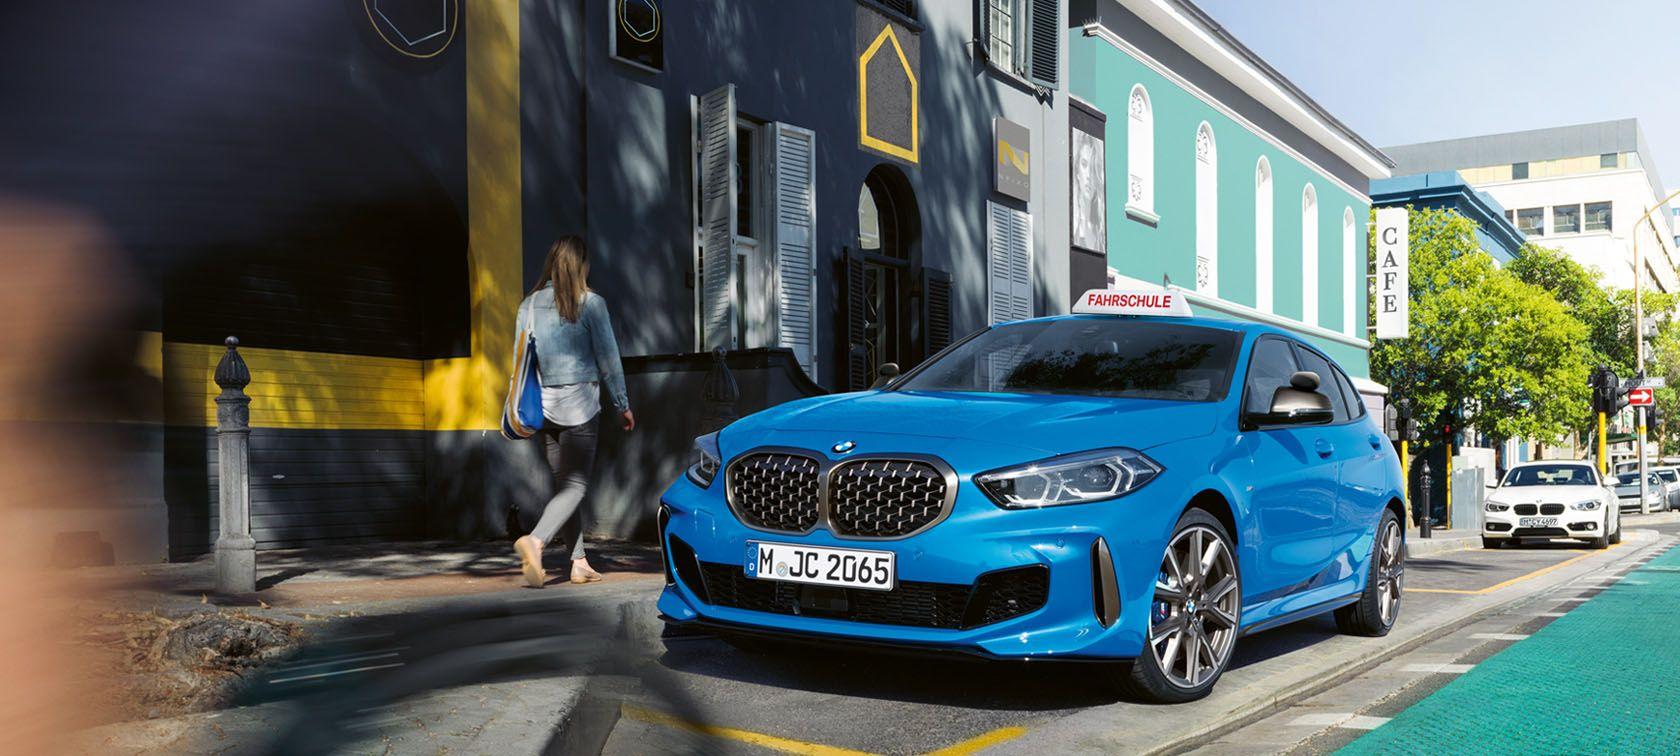 BMW Wagner Service